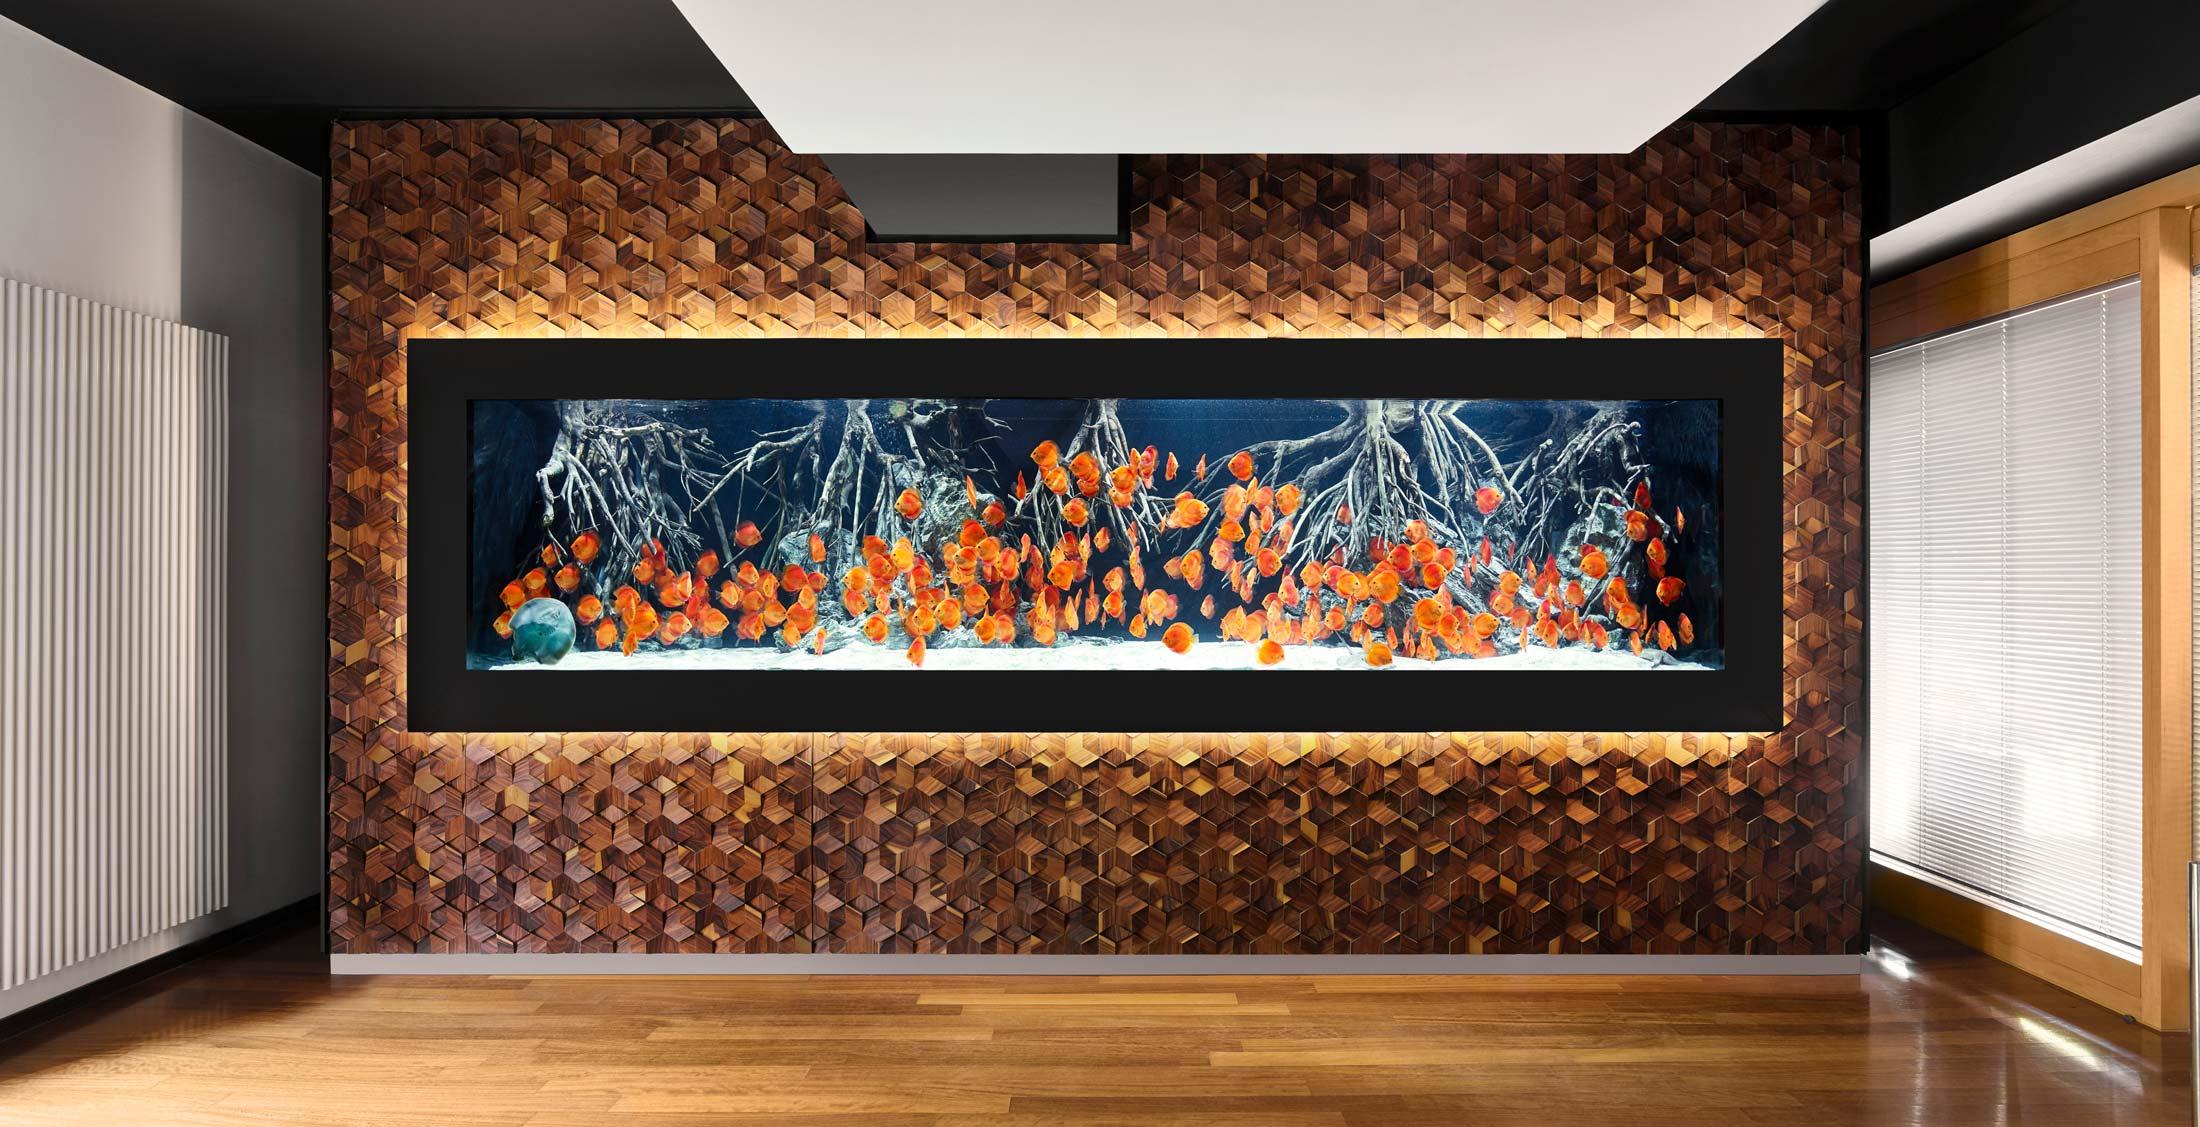 impressionen-wandgestaltung-the-age-of-aquarium-4